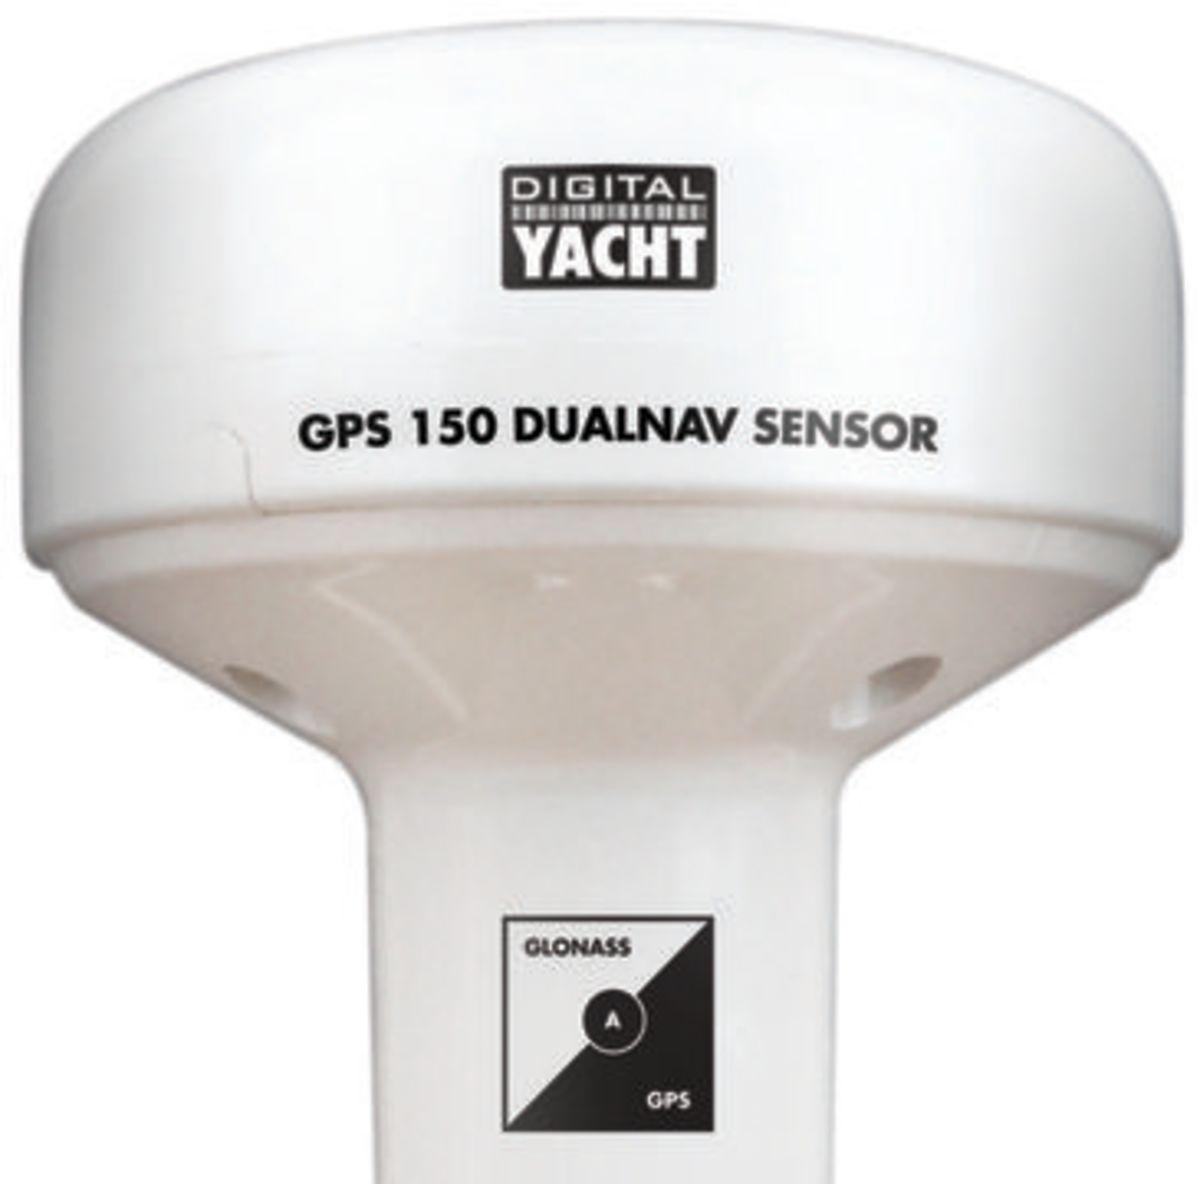 Digital_Yacht_GPS_150_Dualnav.jpg